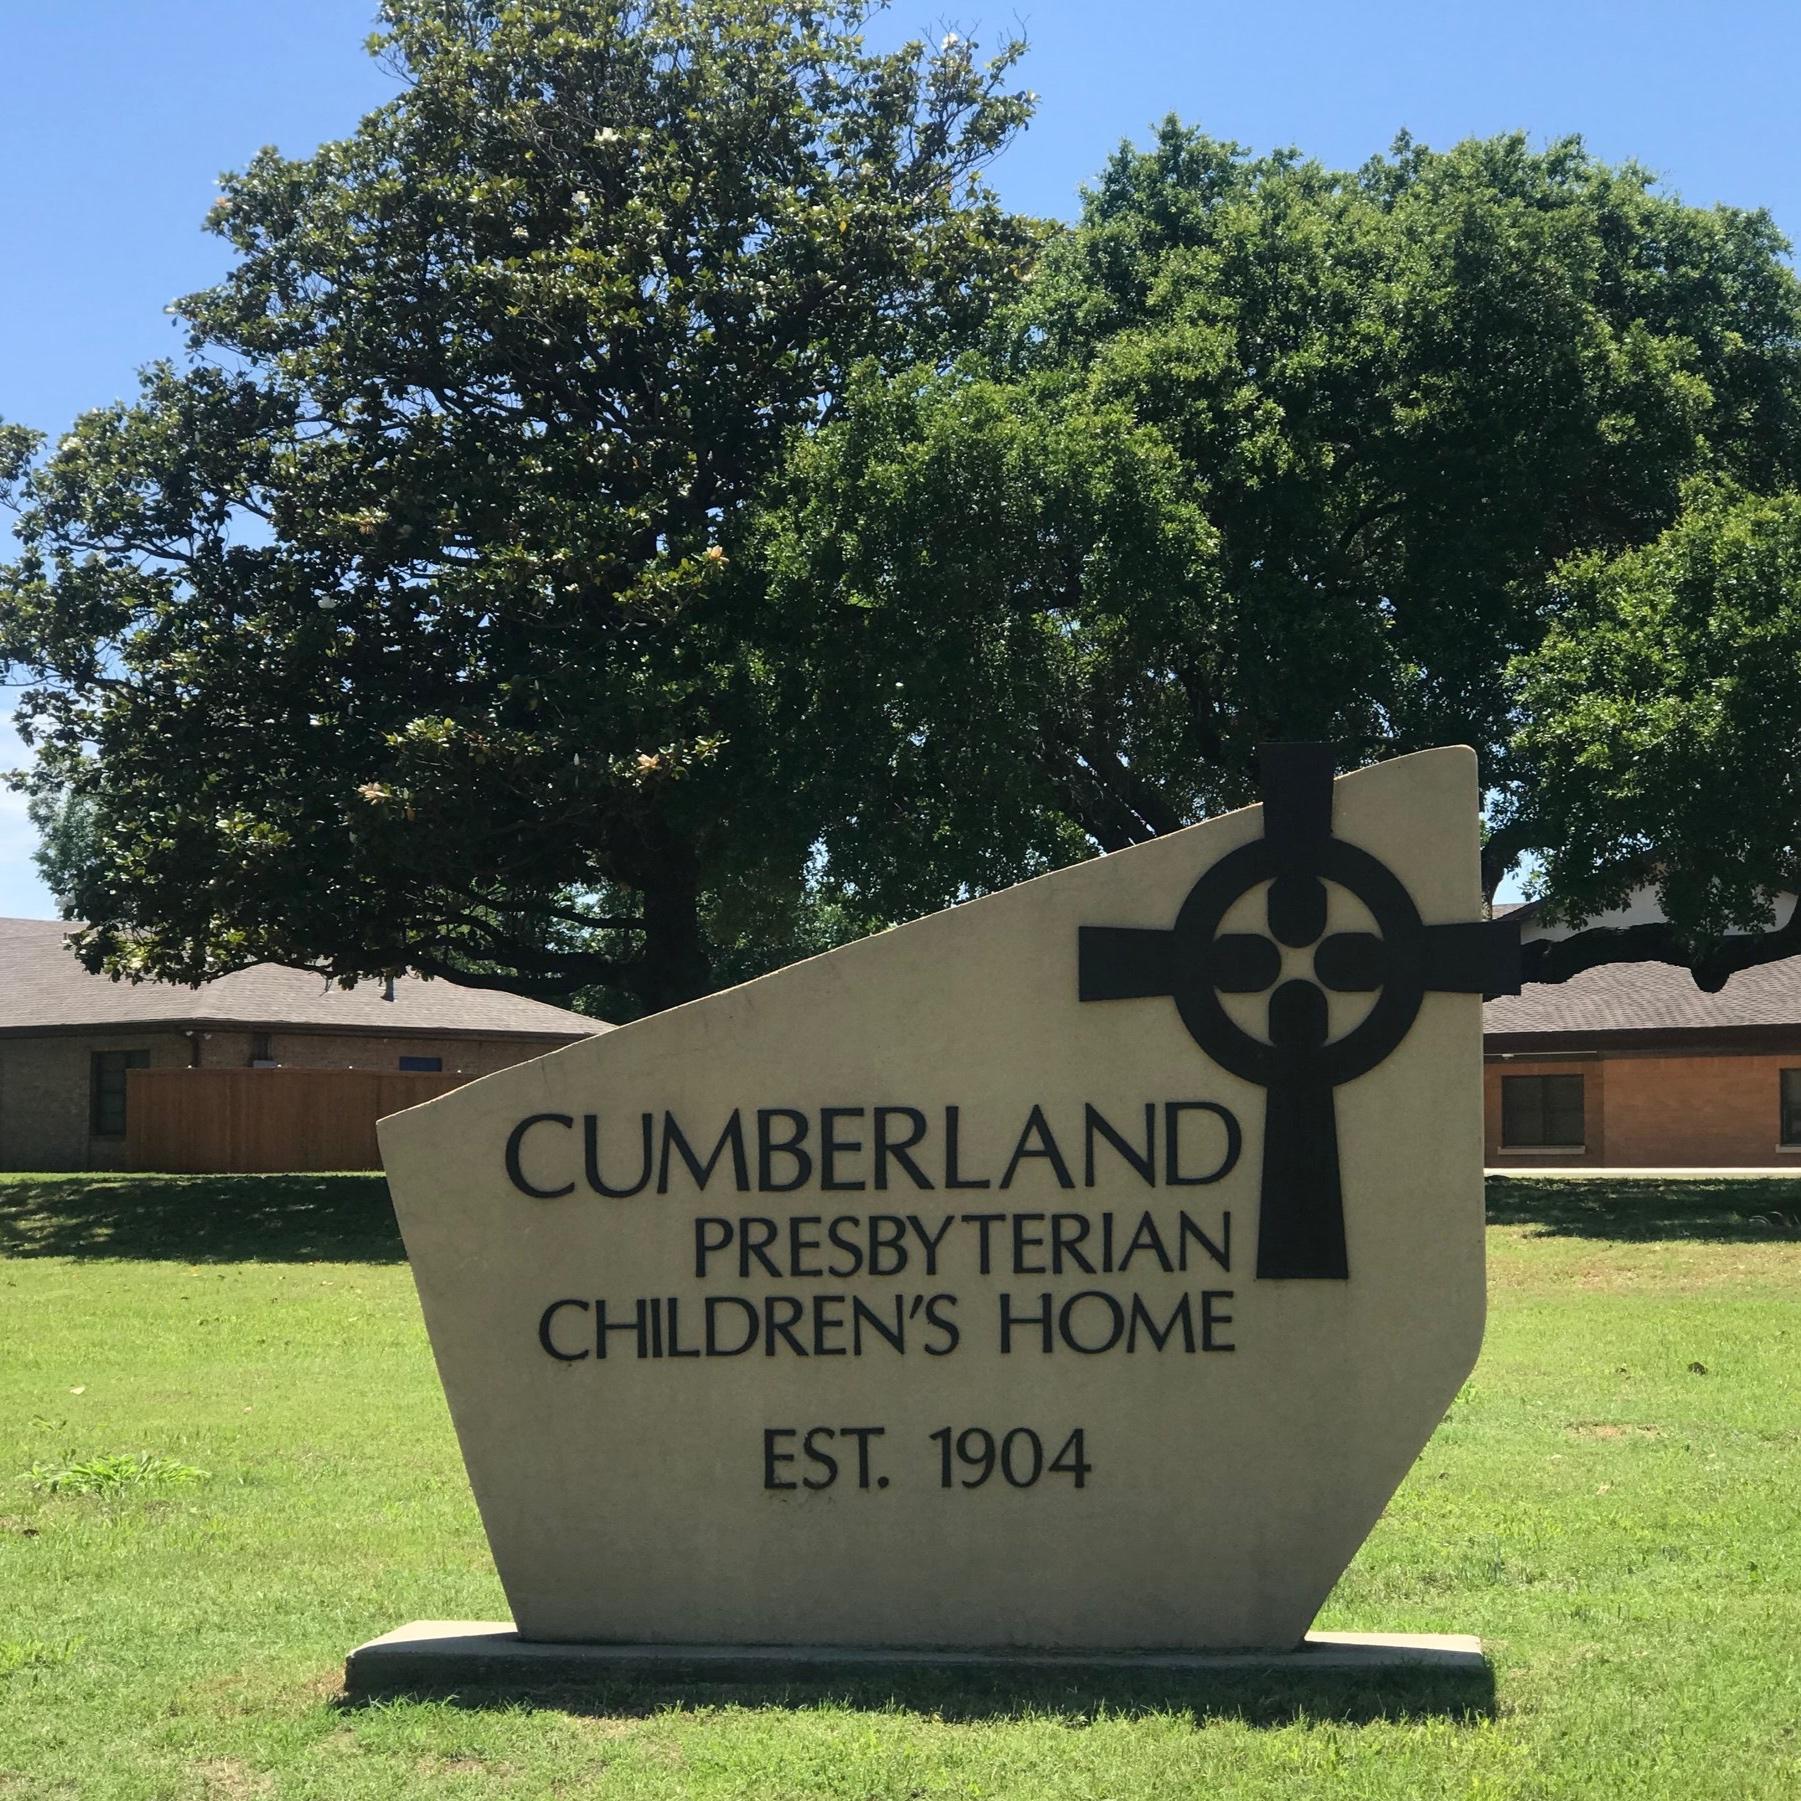 Cumberland+Presbyterian+Children%27s+Home.jpg